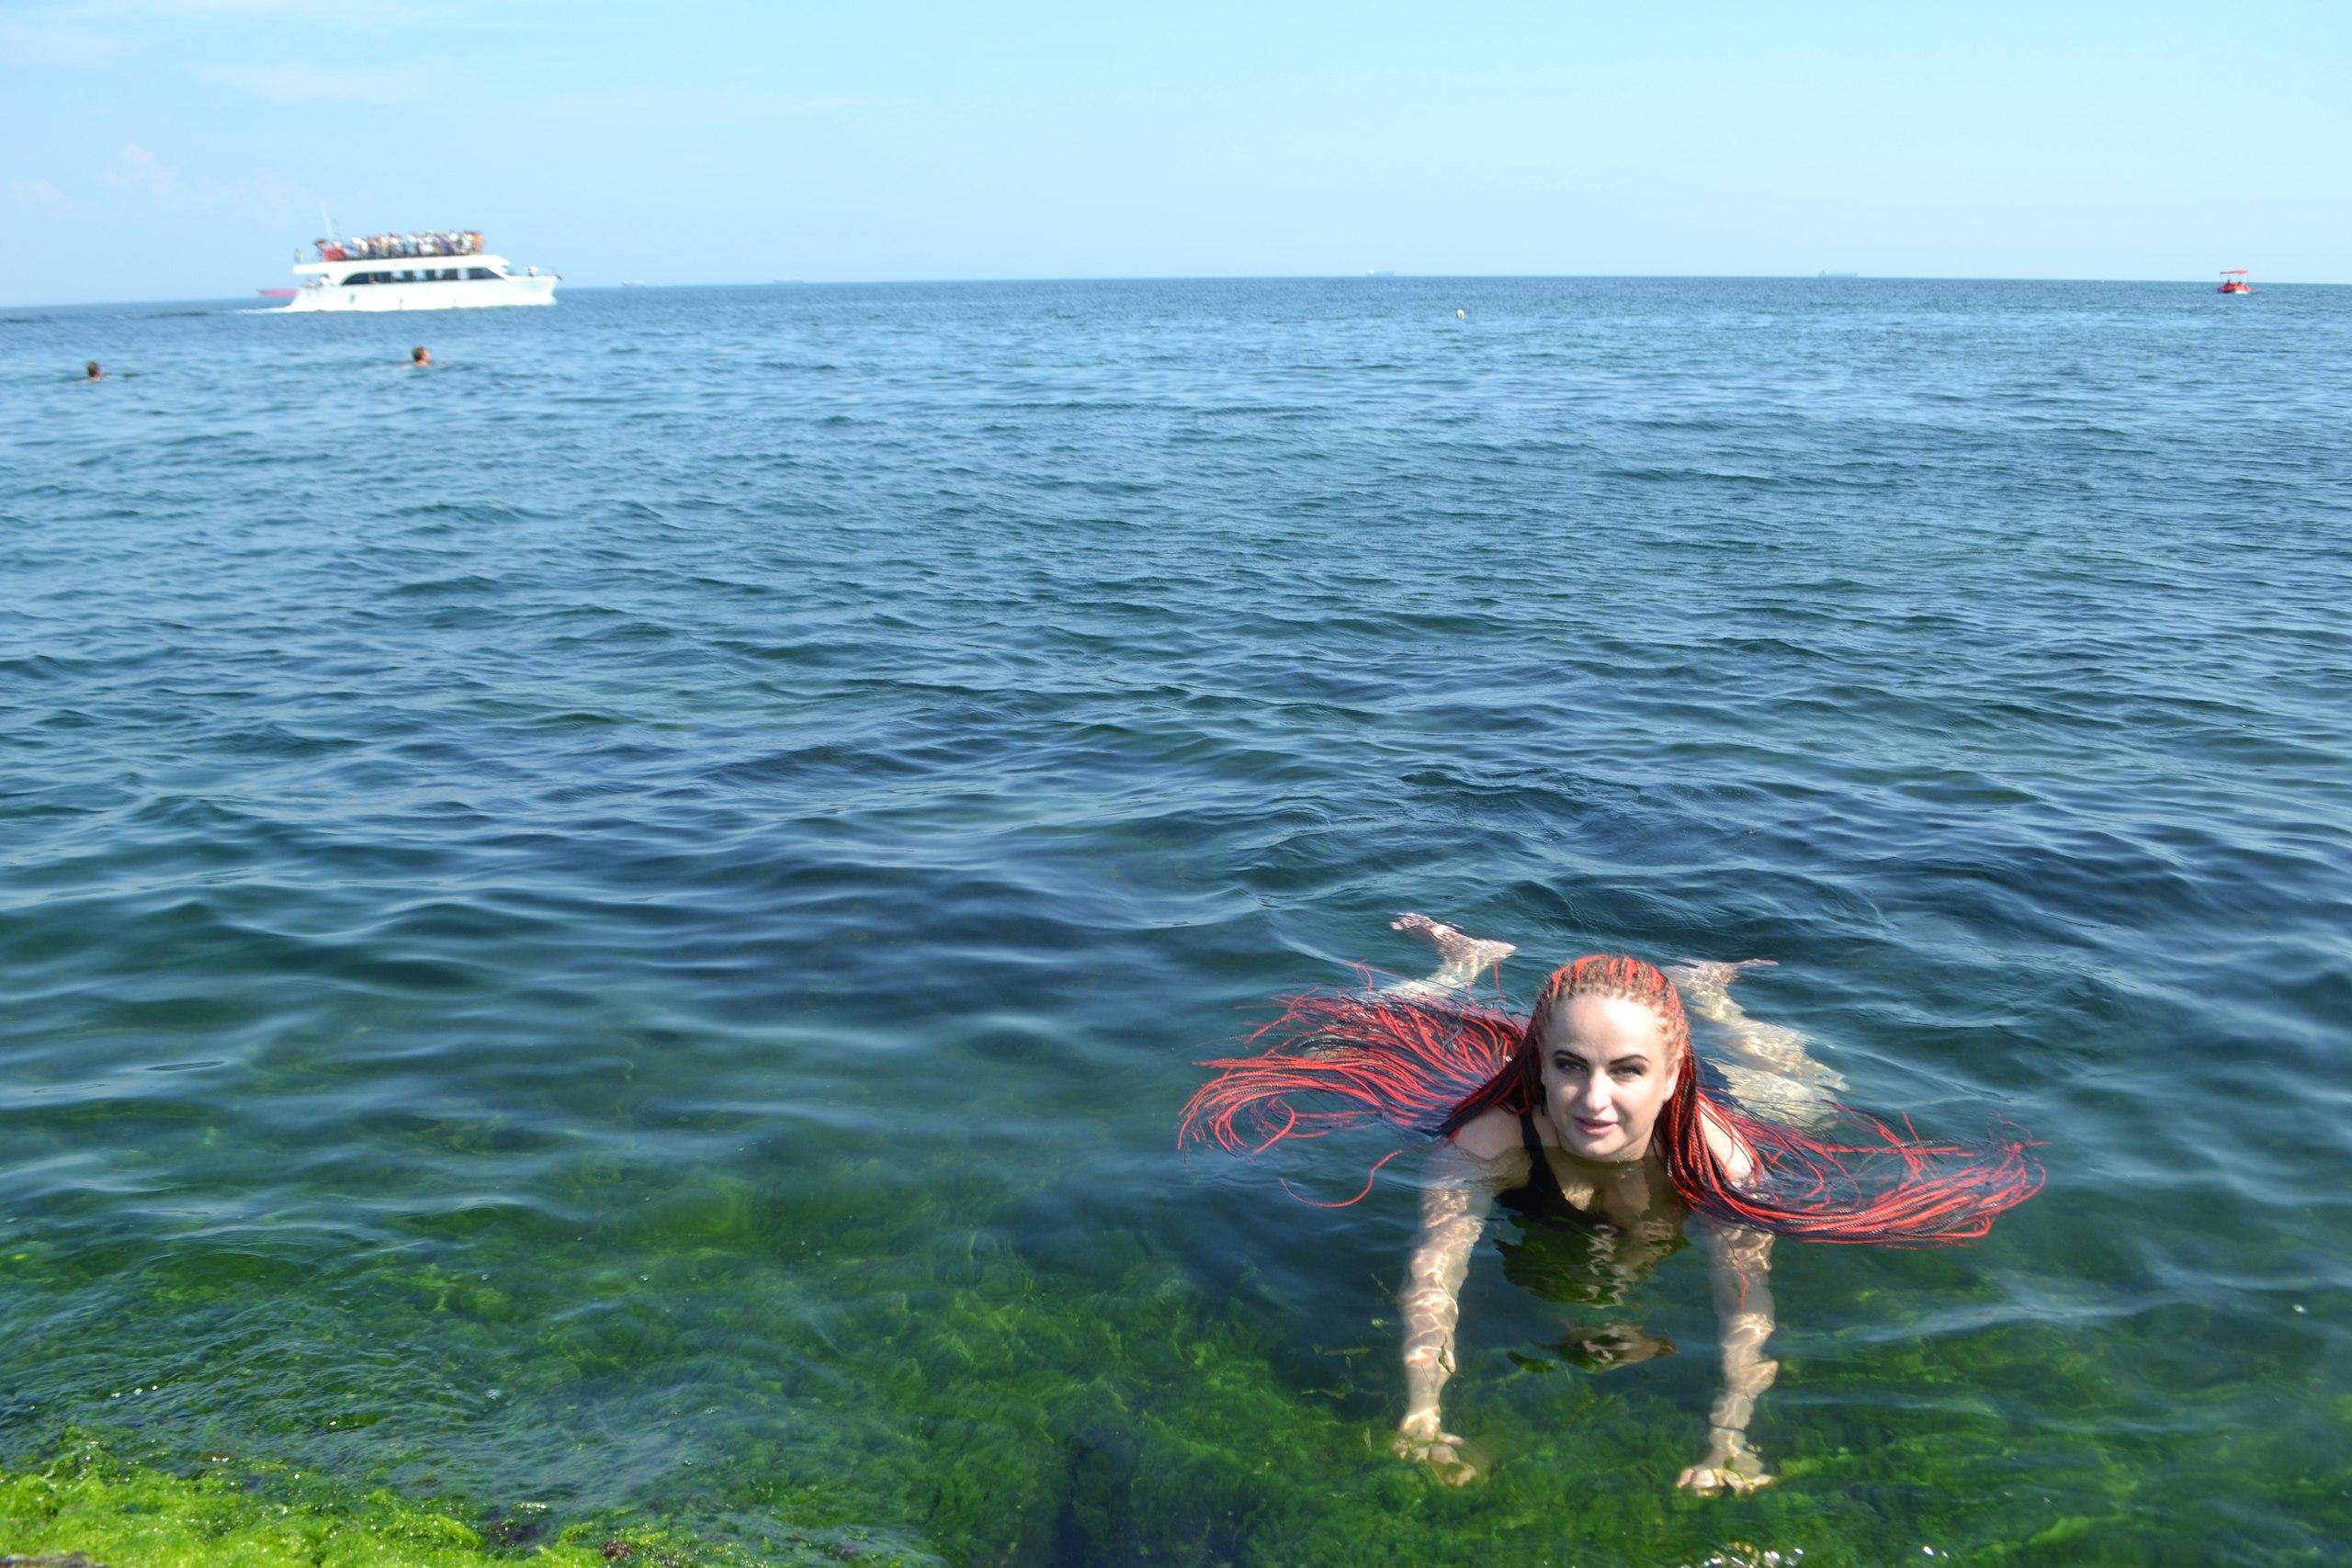 Елена Руденко (Валтея) Украина. Одесса. 17-21 августа 2016 г. MBDR1vJV9rA